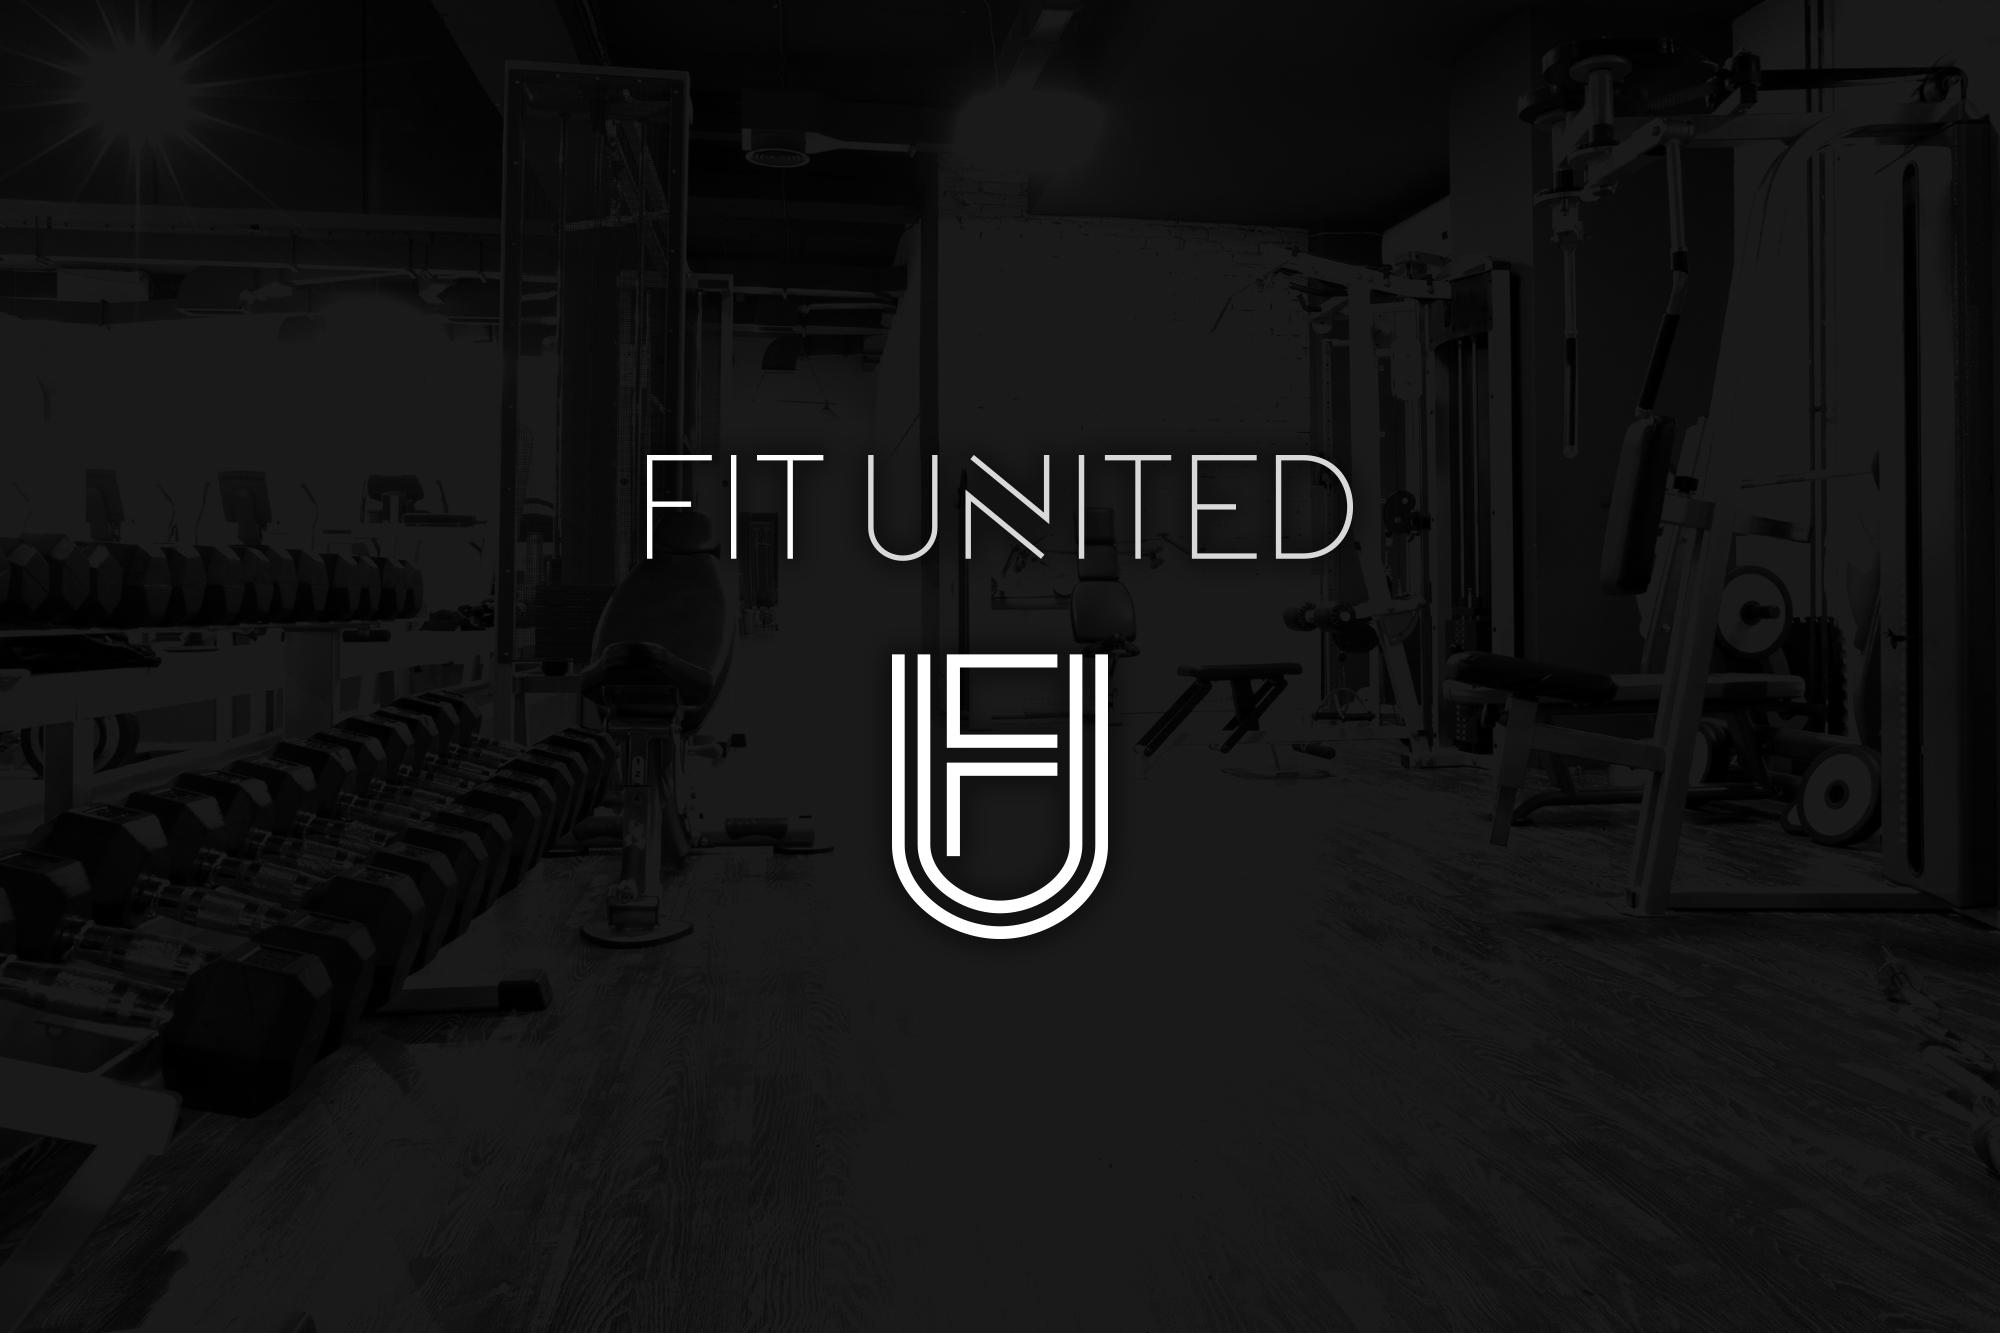 logo_fitunited.jpg